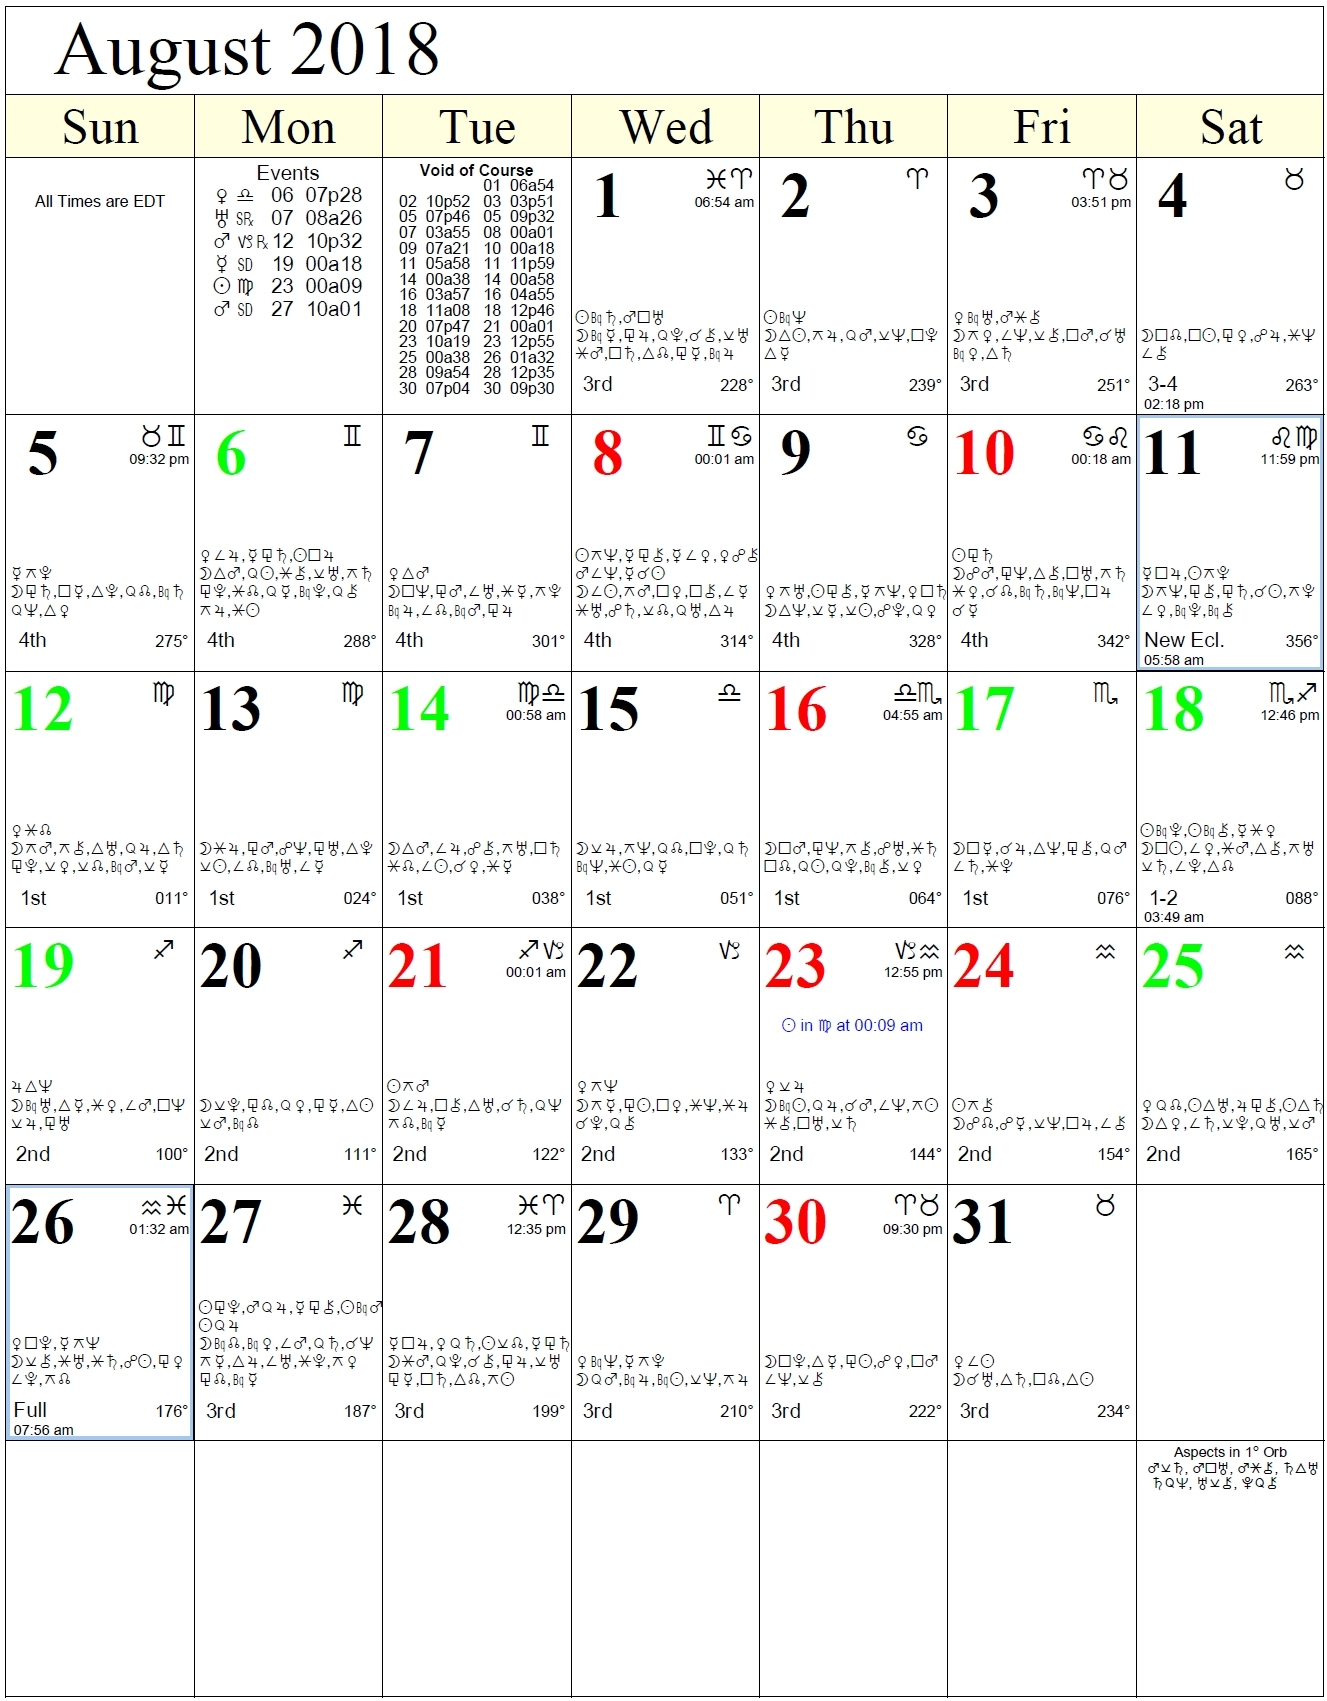 Monthly Astrology Calendars-Lunar Calendar With Zodiac Signs